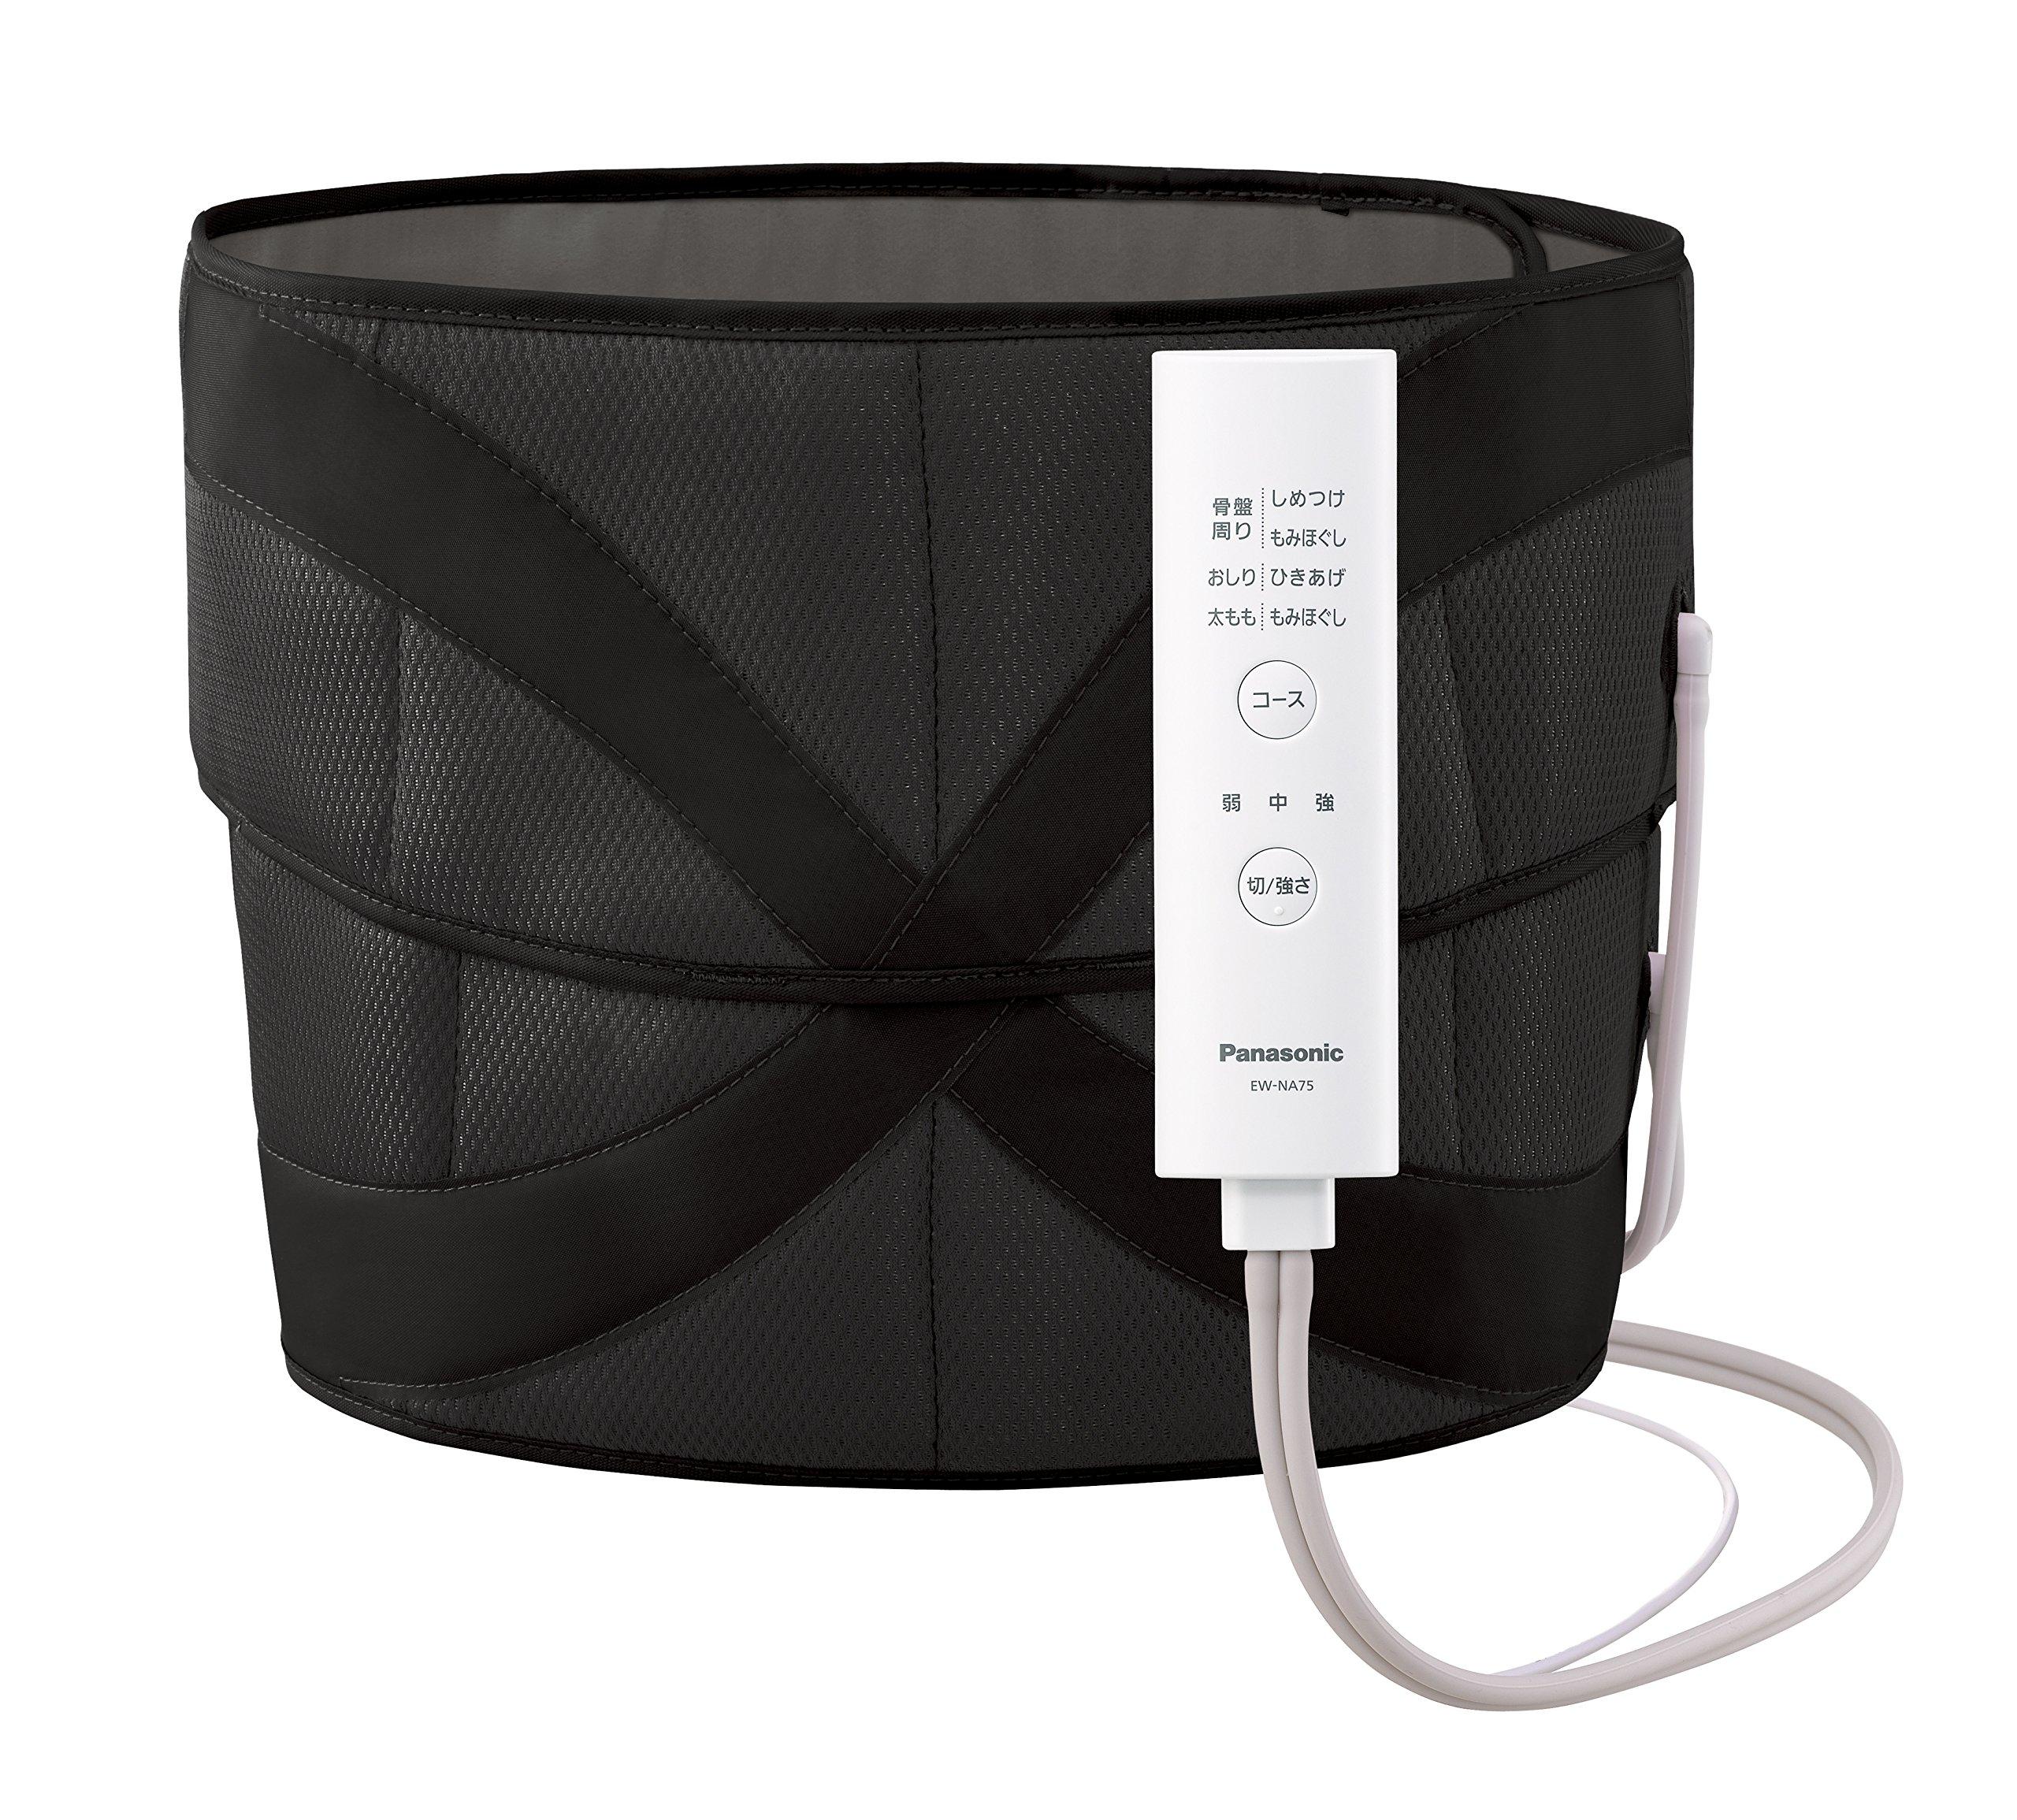 Panasonic air massager pelvis hip reflation Black EW-NA75-K